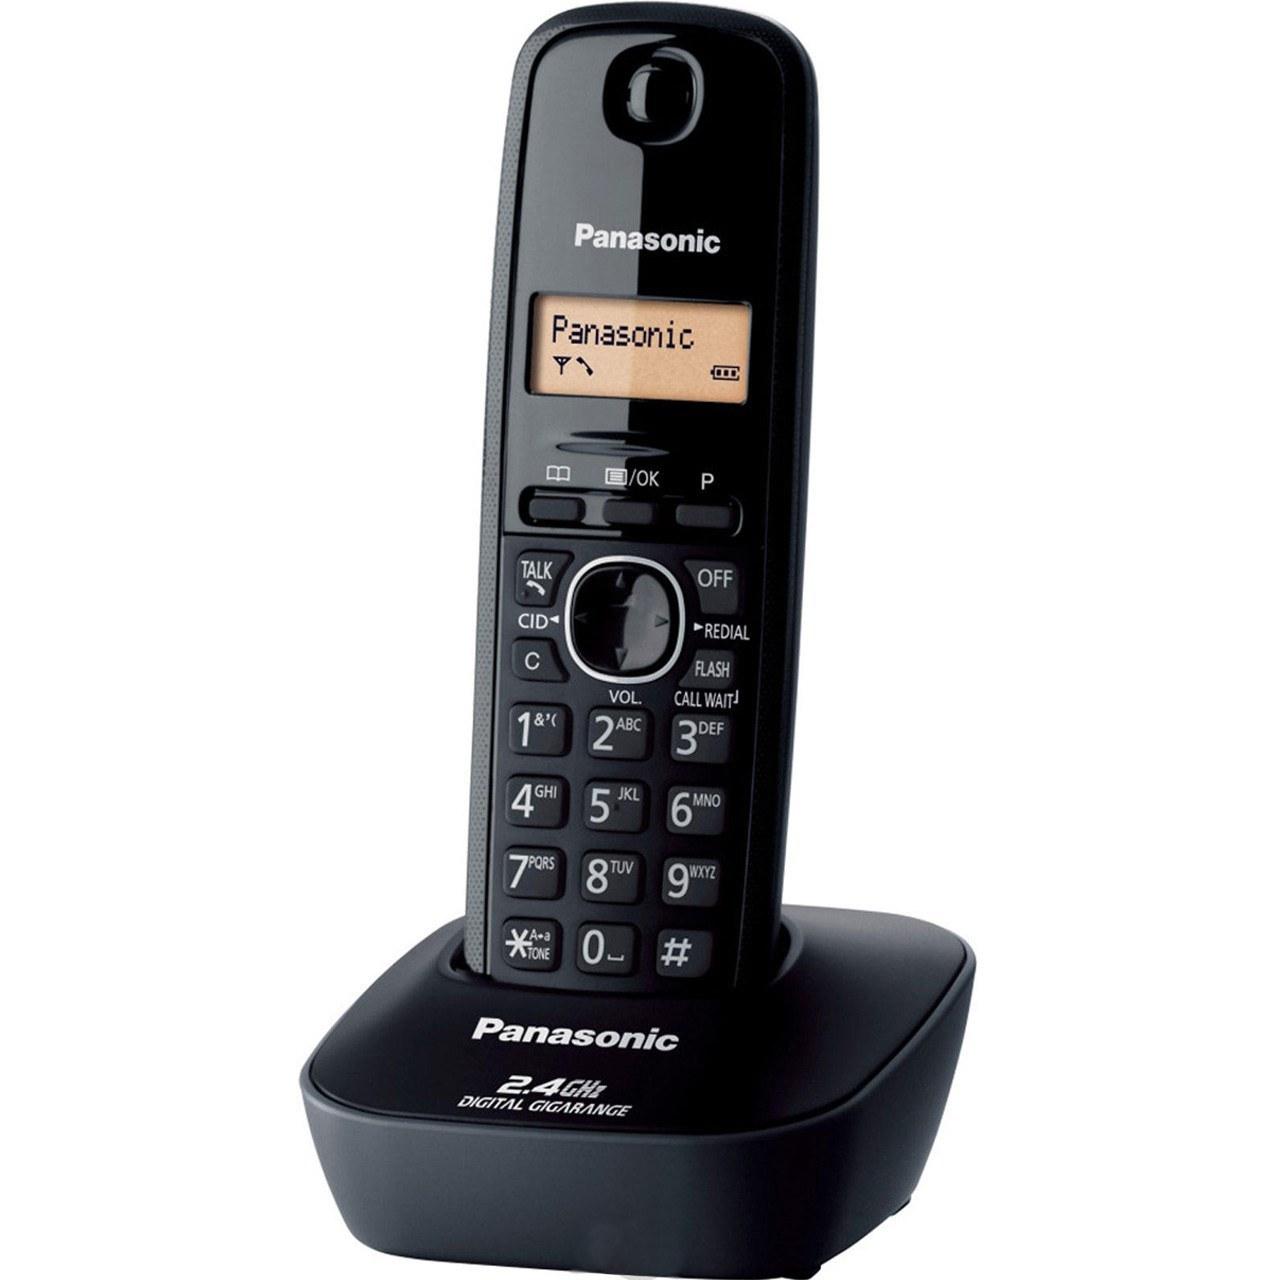 تصویر گوشی تلفن  بی سیم  پاناسونیک Panasonic Cordless Telephone KX-TG3411